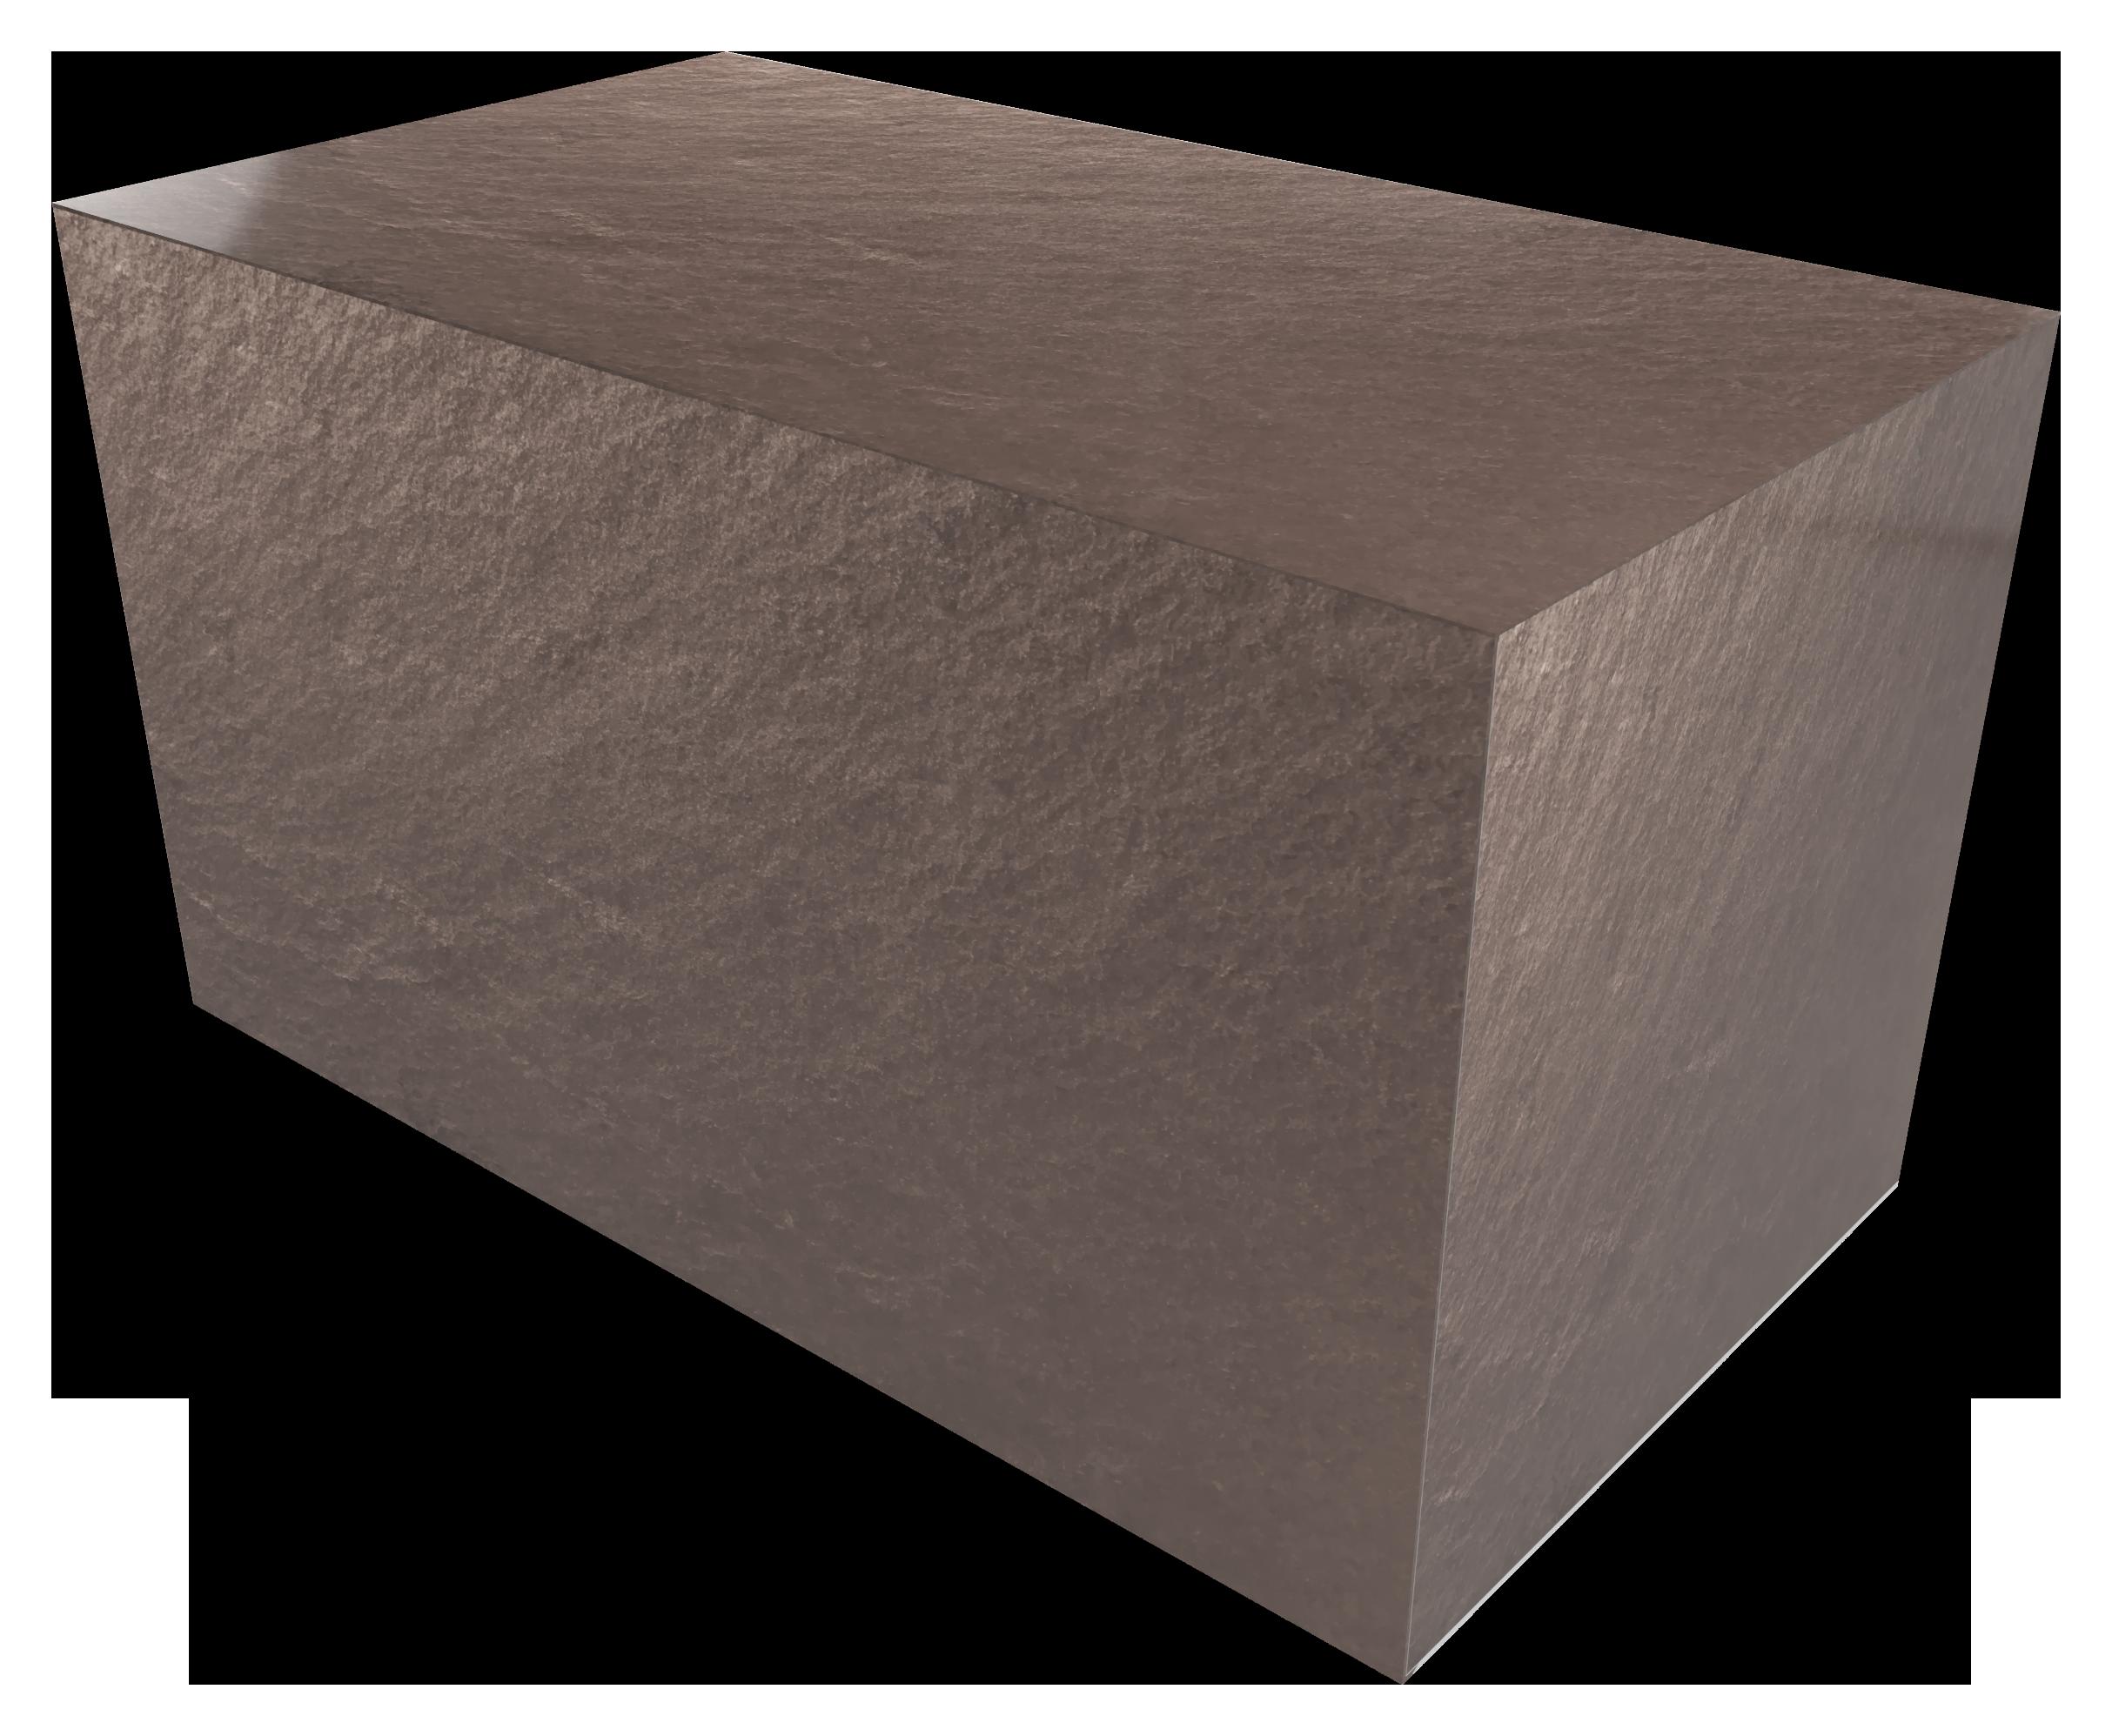 Ashes casket BROWN SLATE